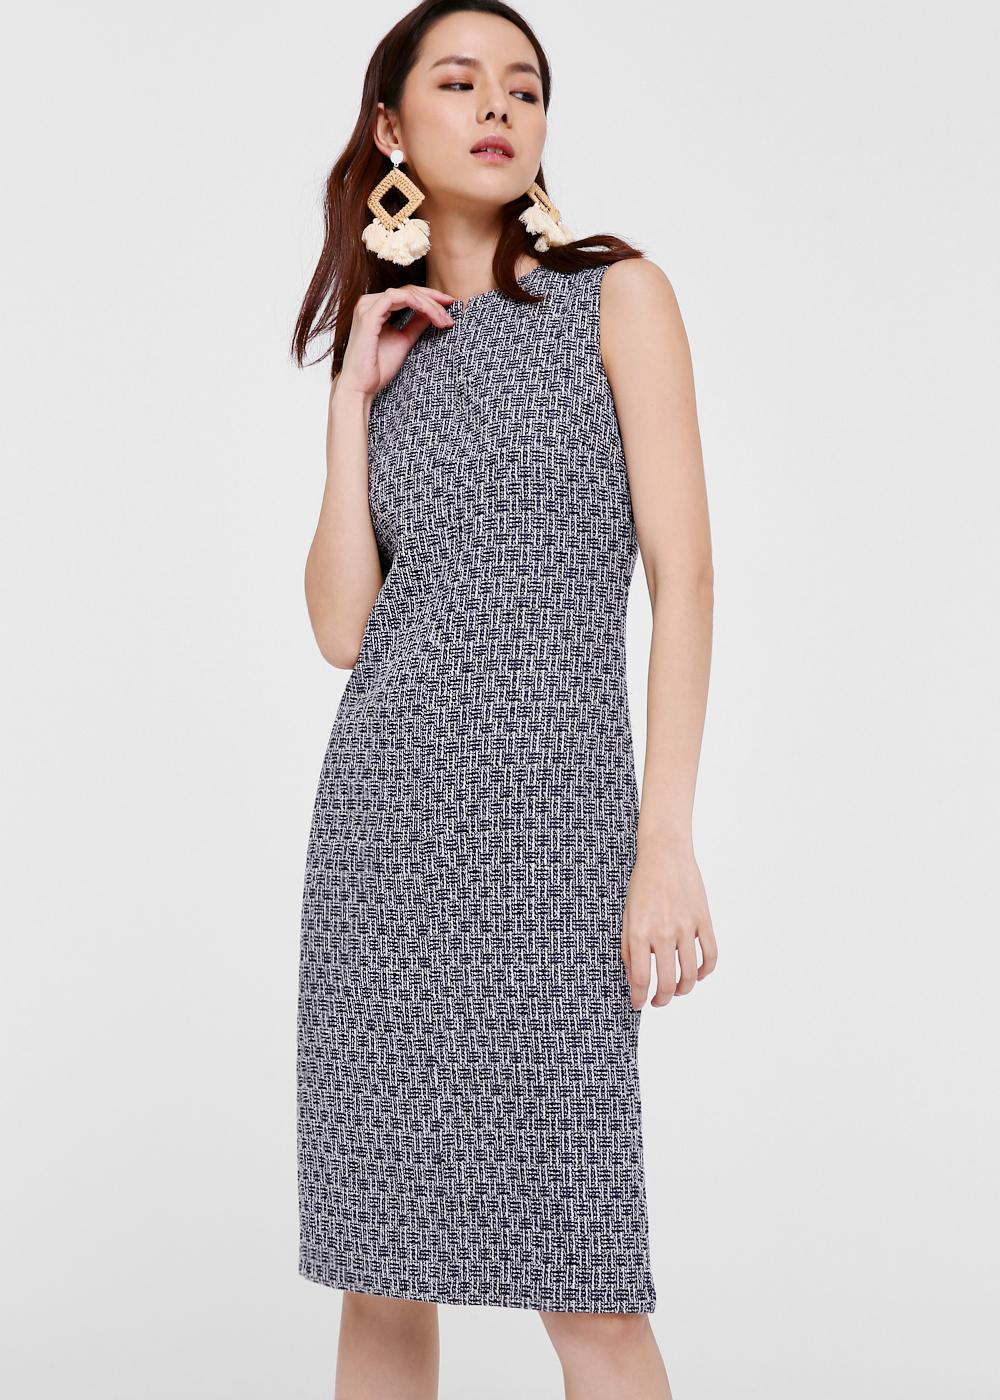 Katlyn Tweed Notch Neck Midi Dress